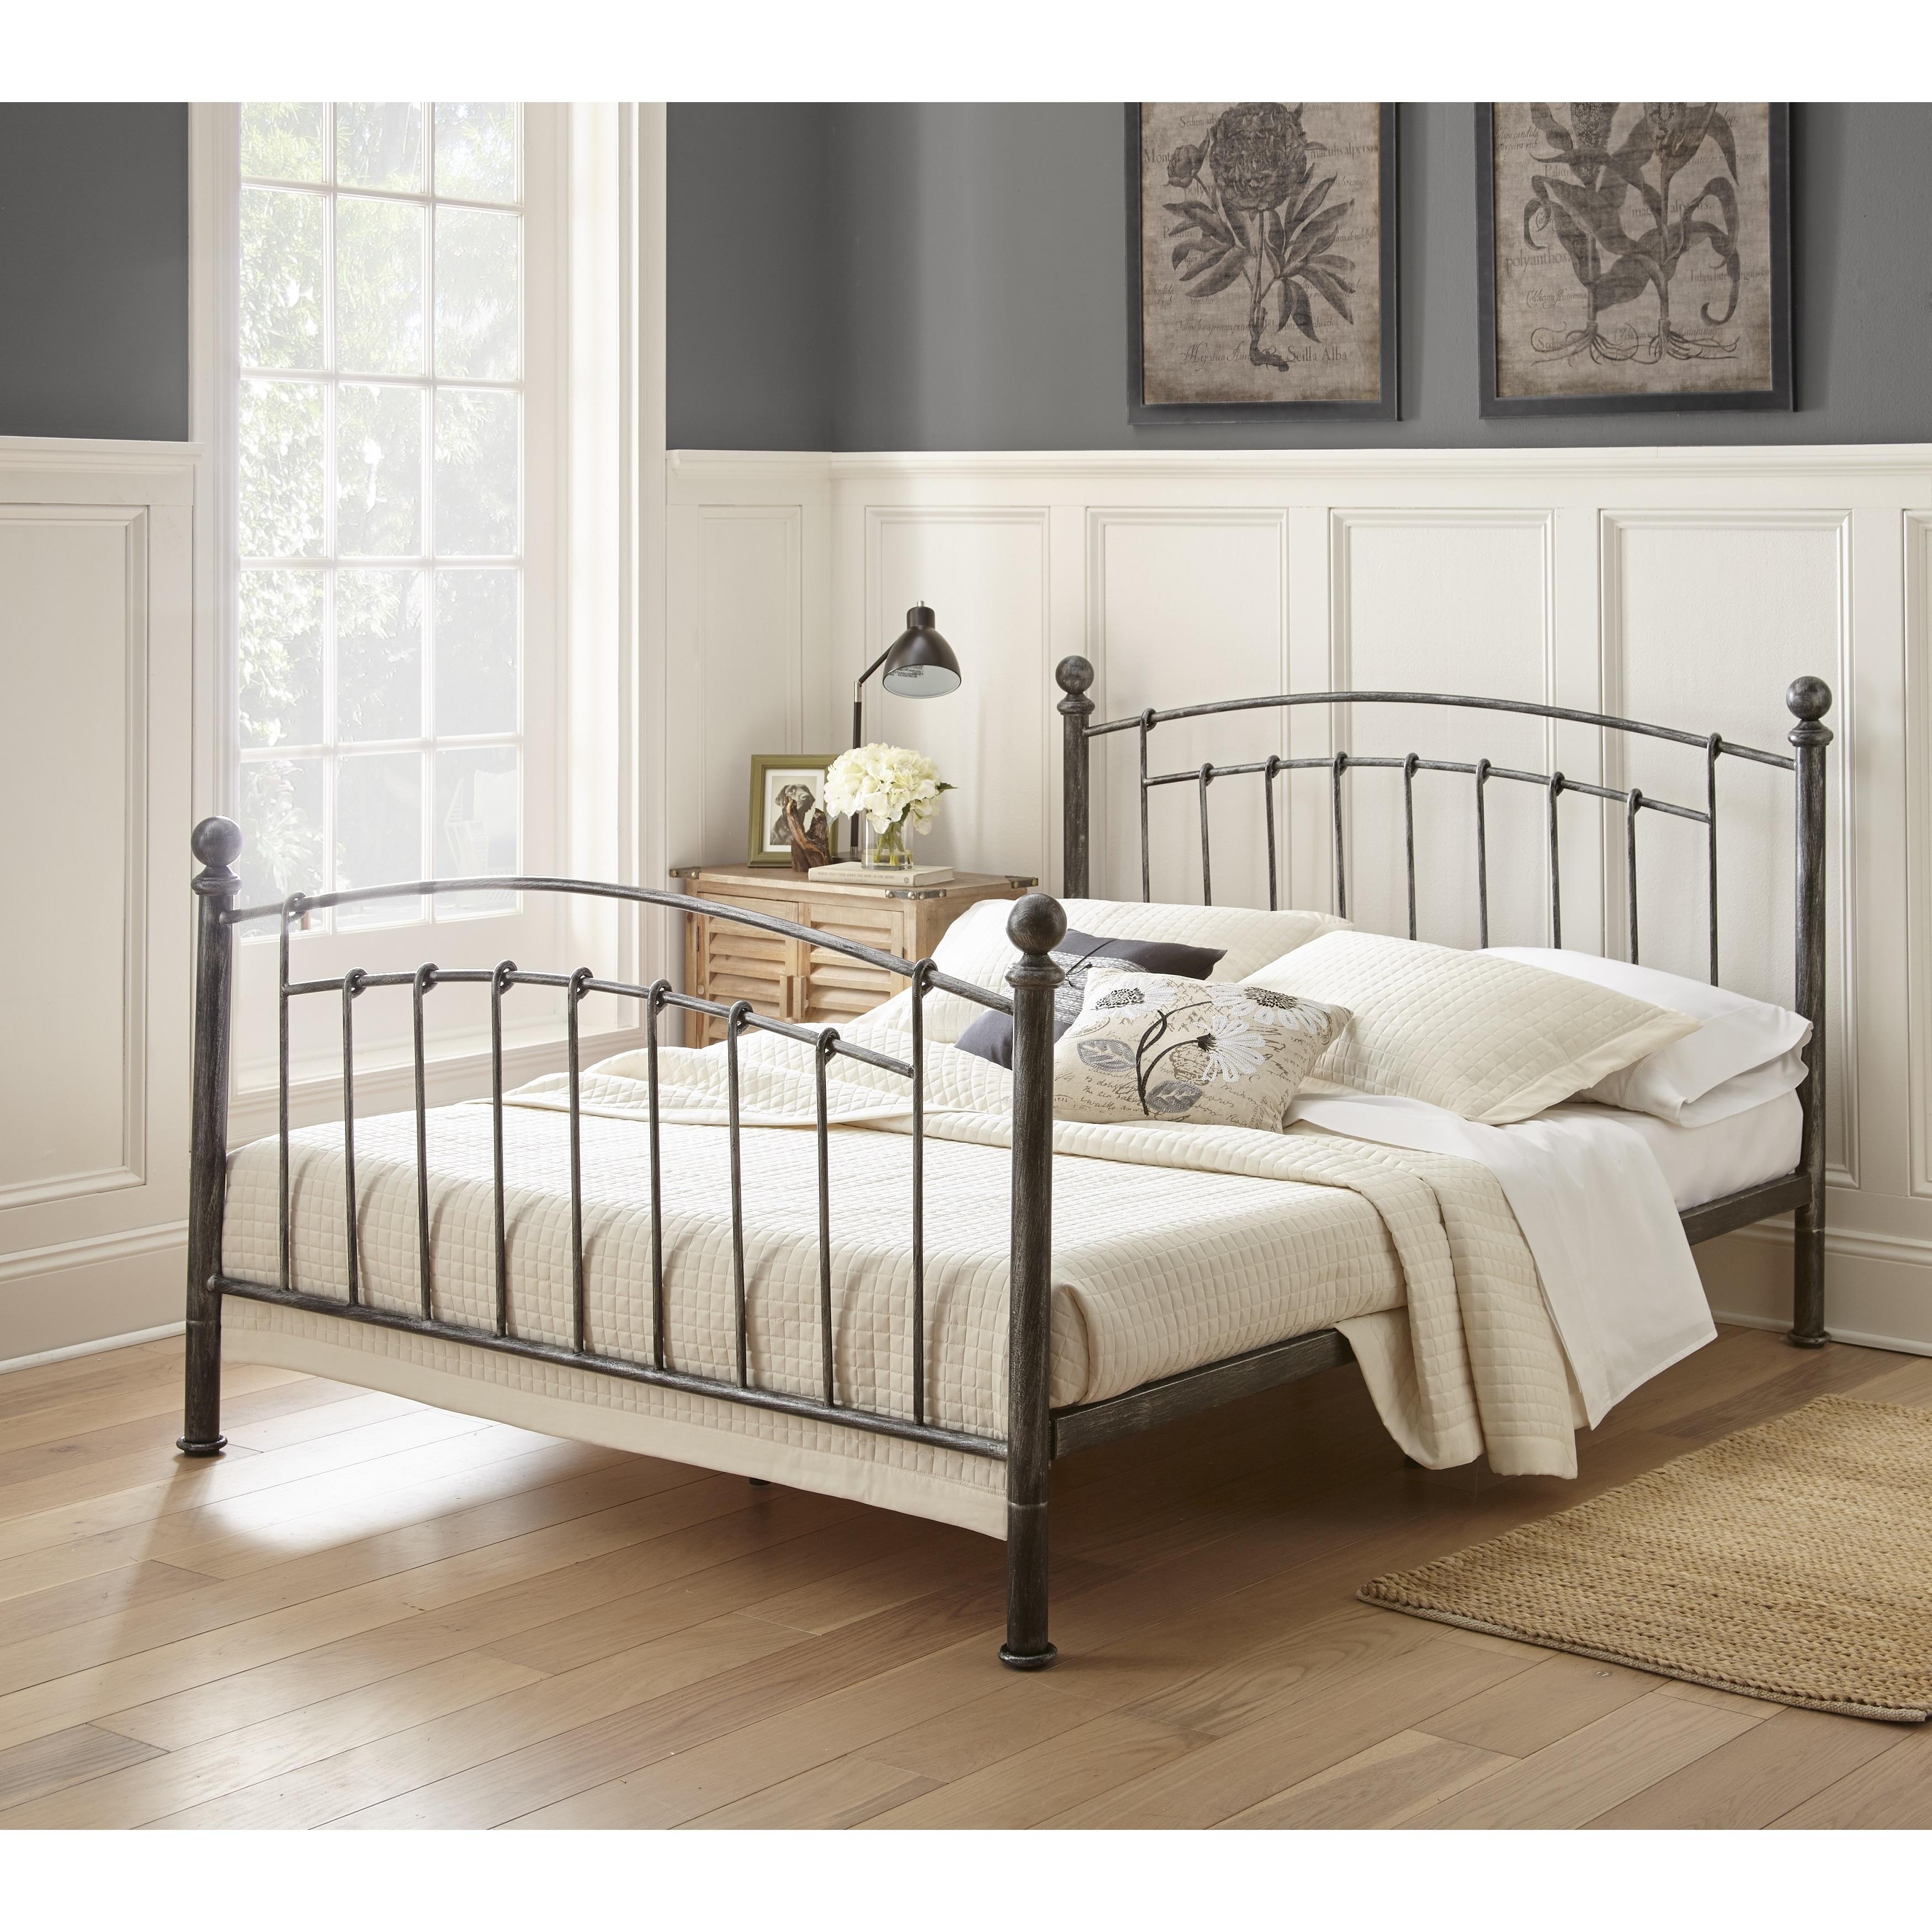 Sleep Sync Medina Metal Platform Bed (Queen), Black